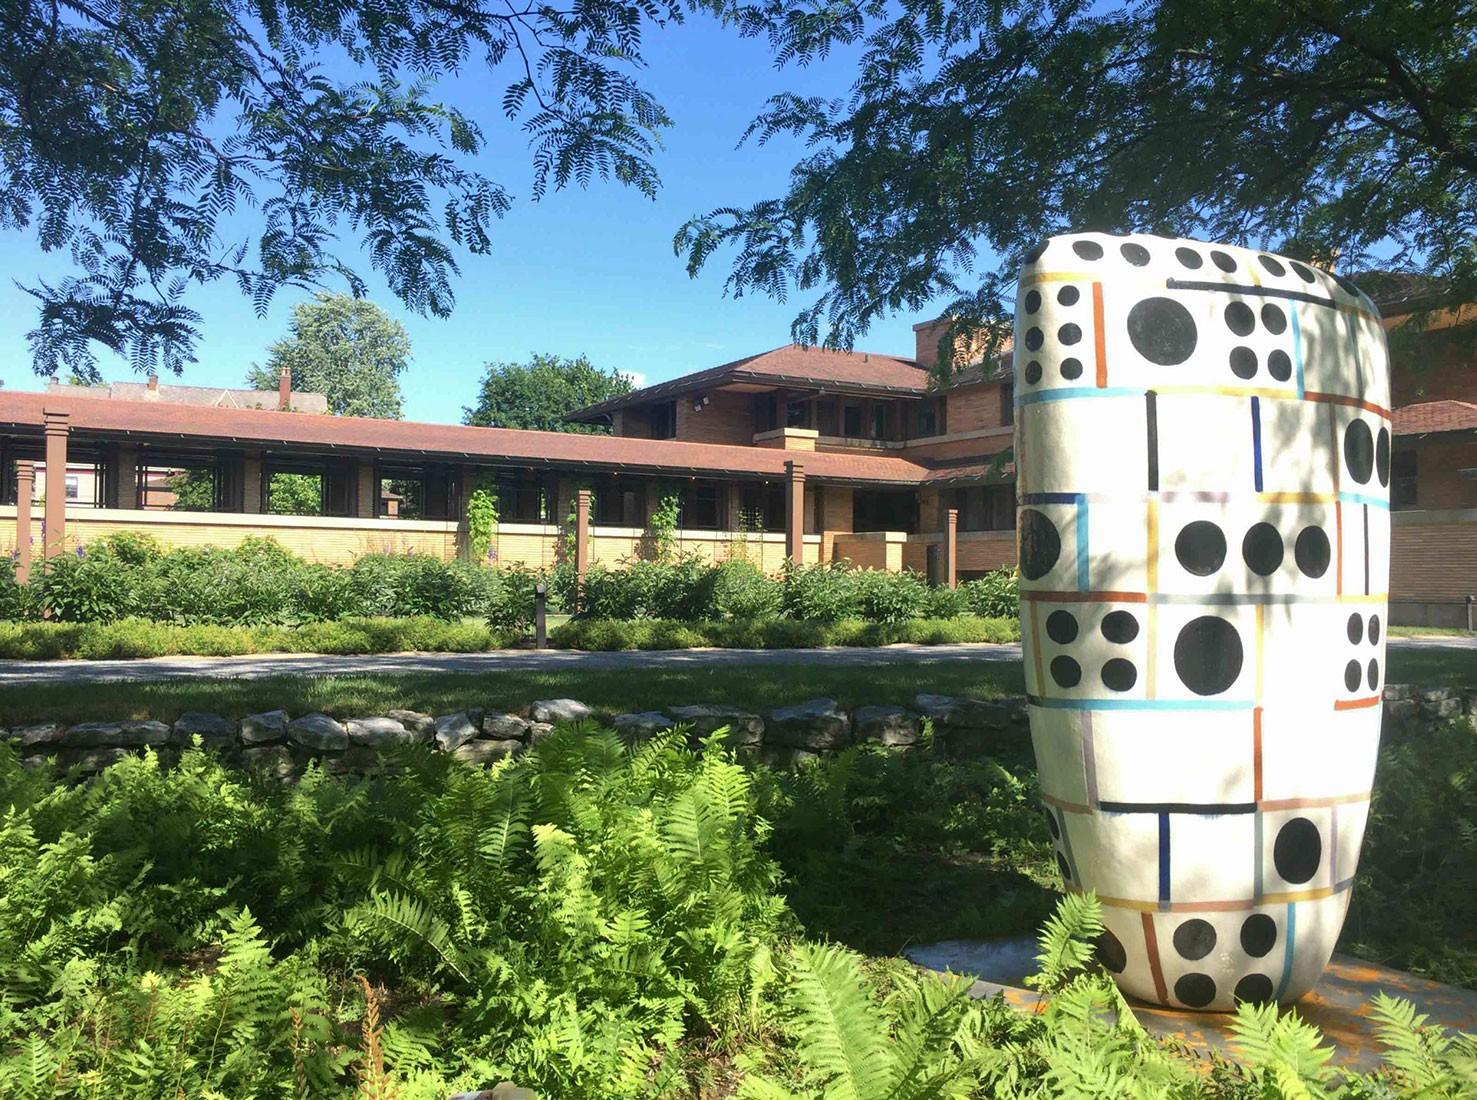 Japanese sculpture park on Frank Lloyd Wright's Villa